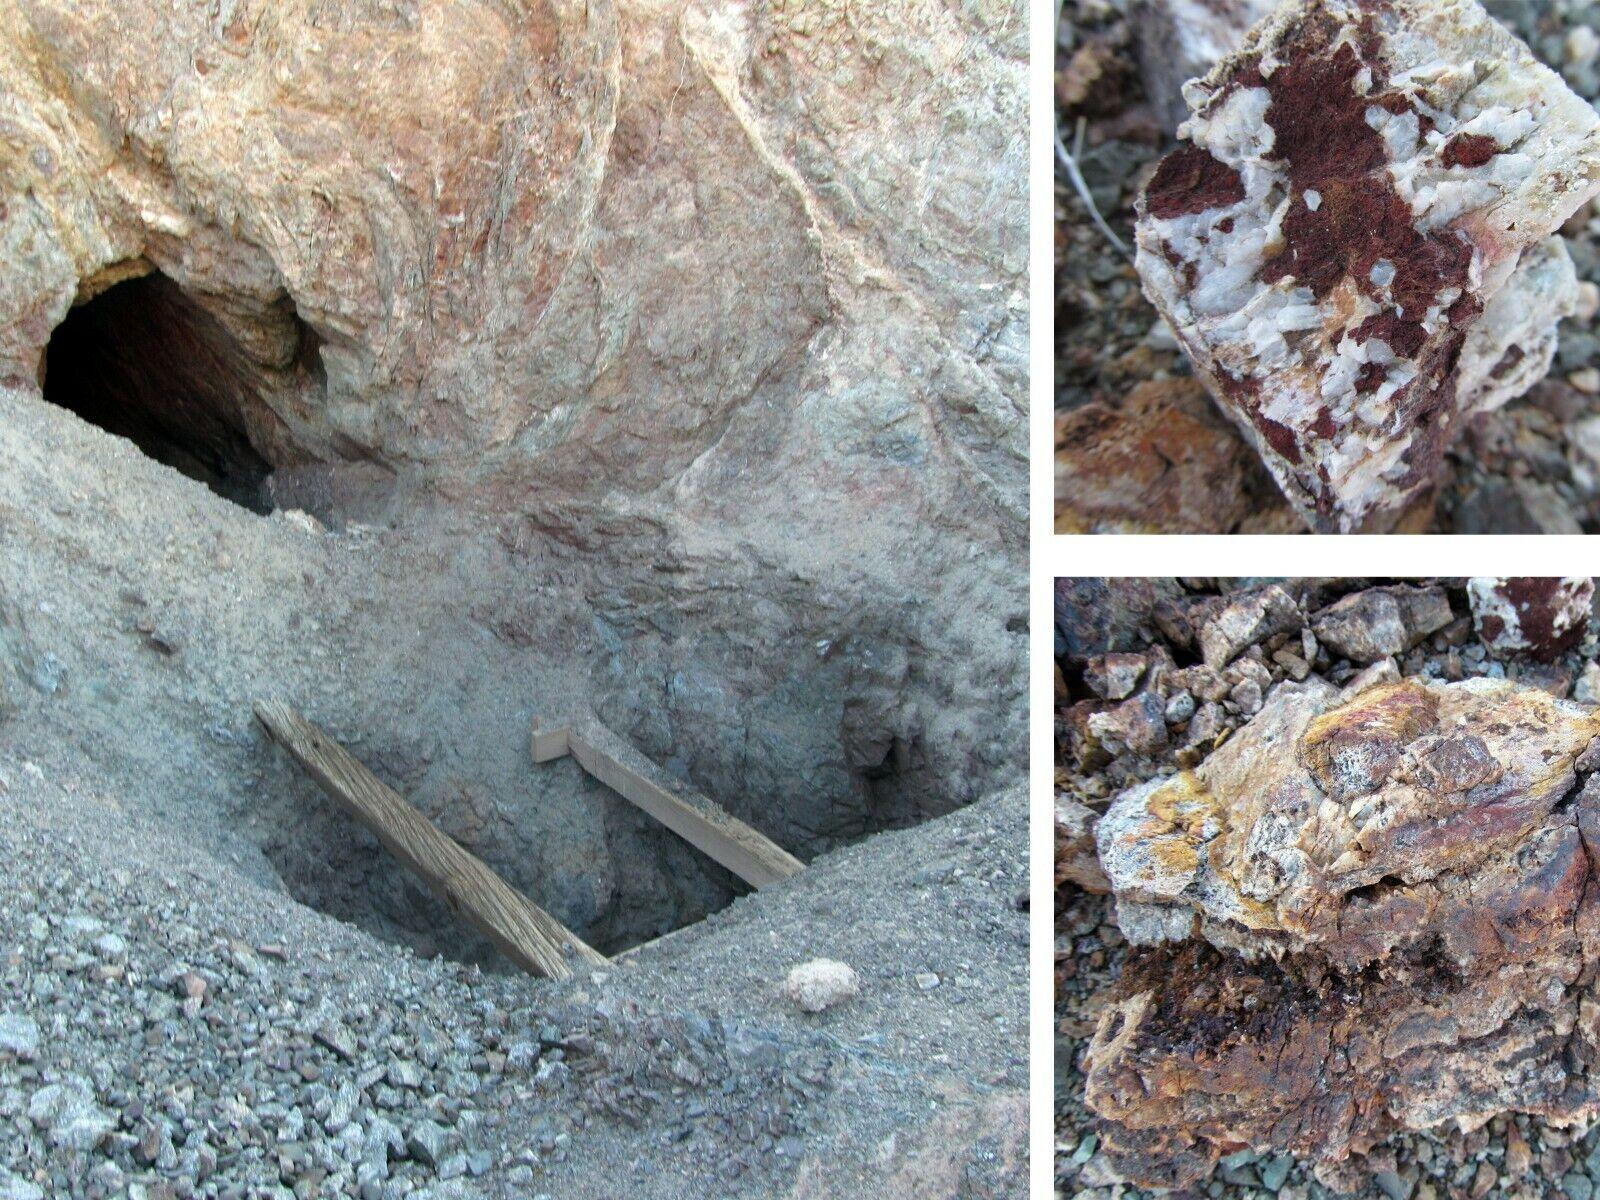 California Gold Mine San Bernardino County Silver Mining Claim Adit Tunnel Shaft